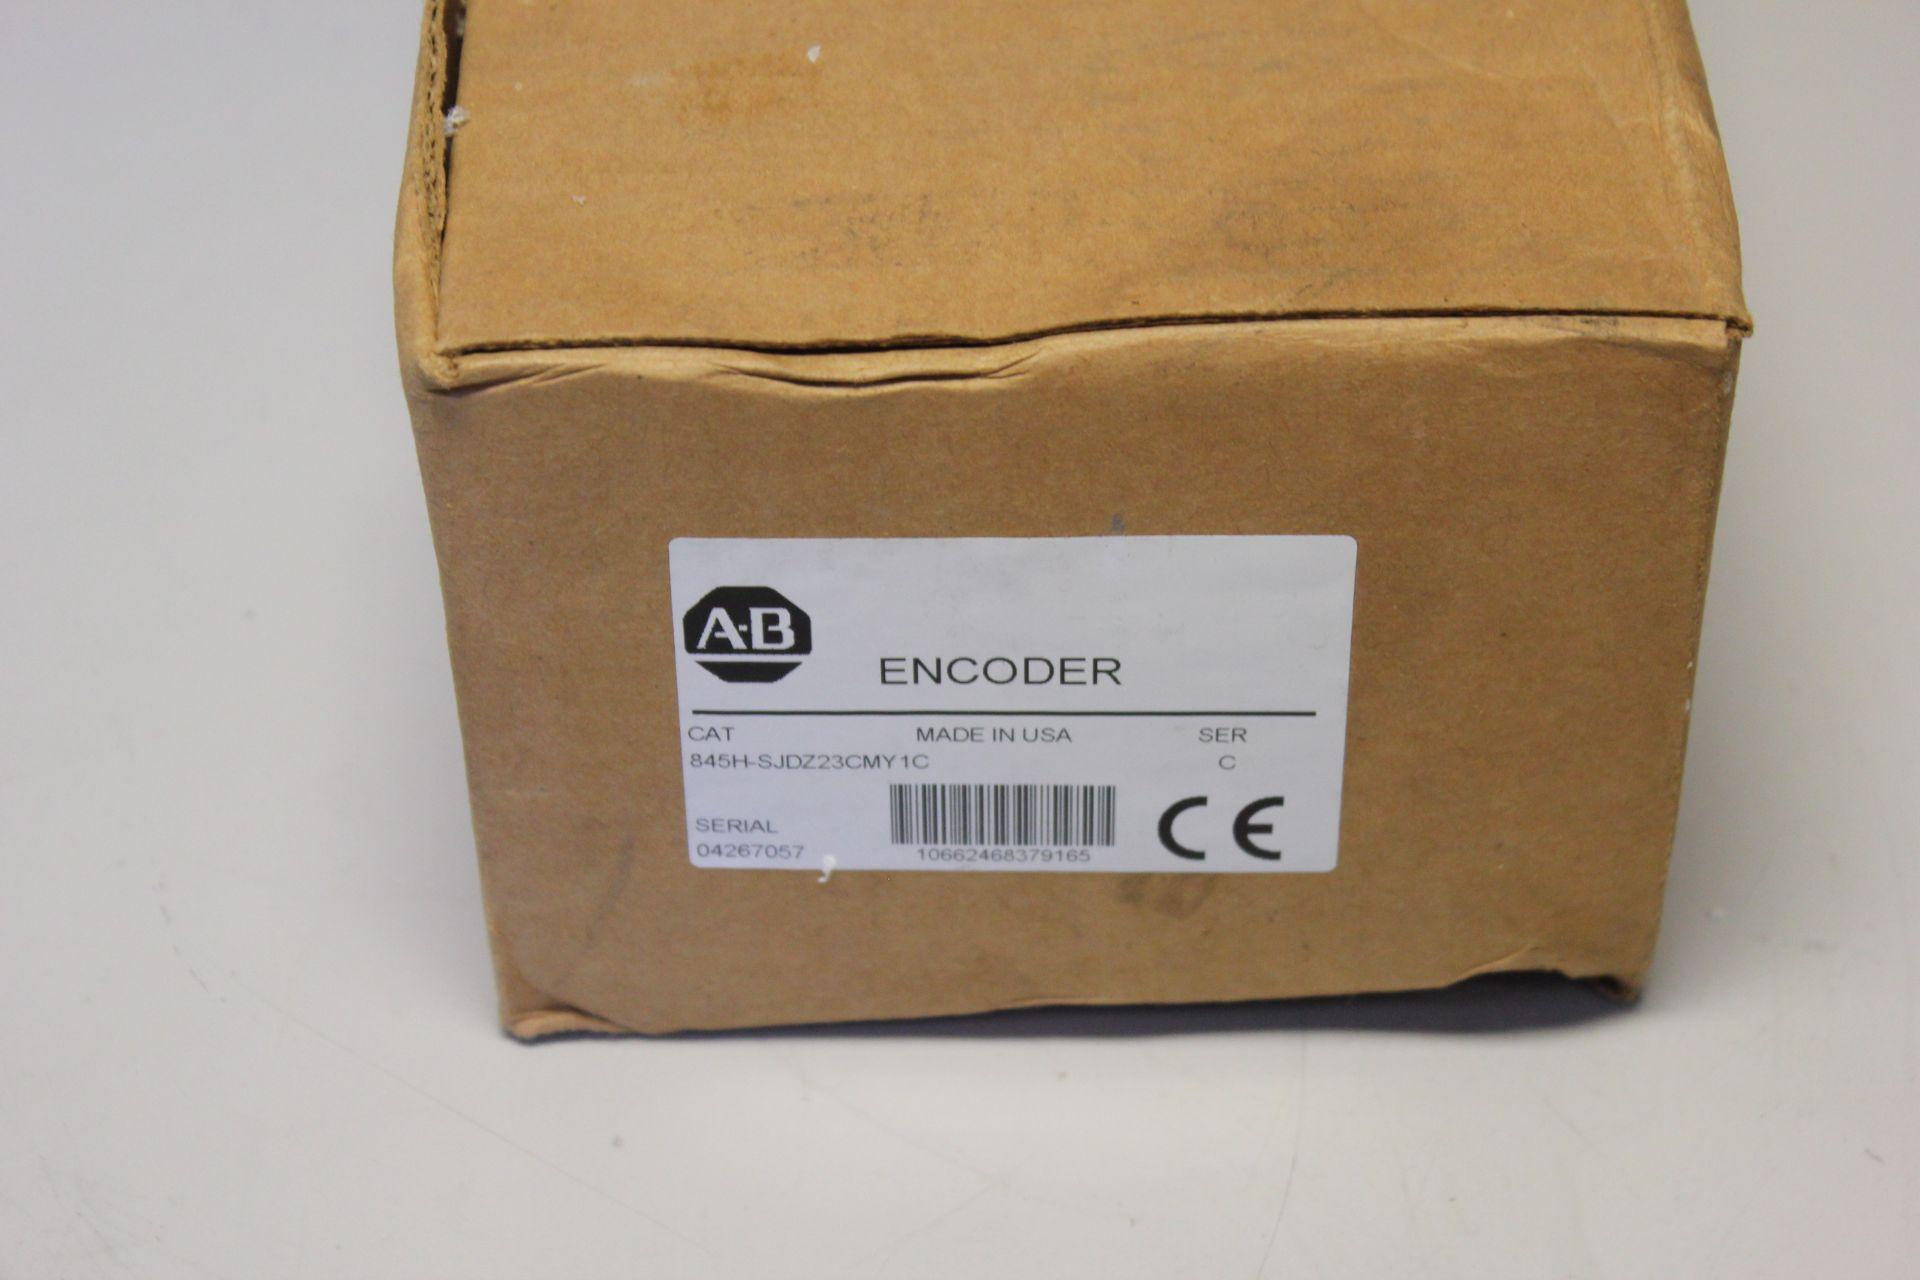 NEW ALLEN BRADLEY OPTICAL ENCODER - Image 2 of 5